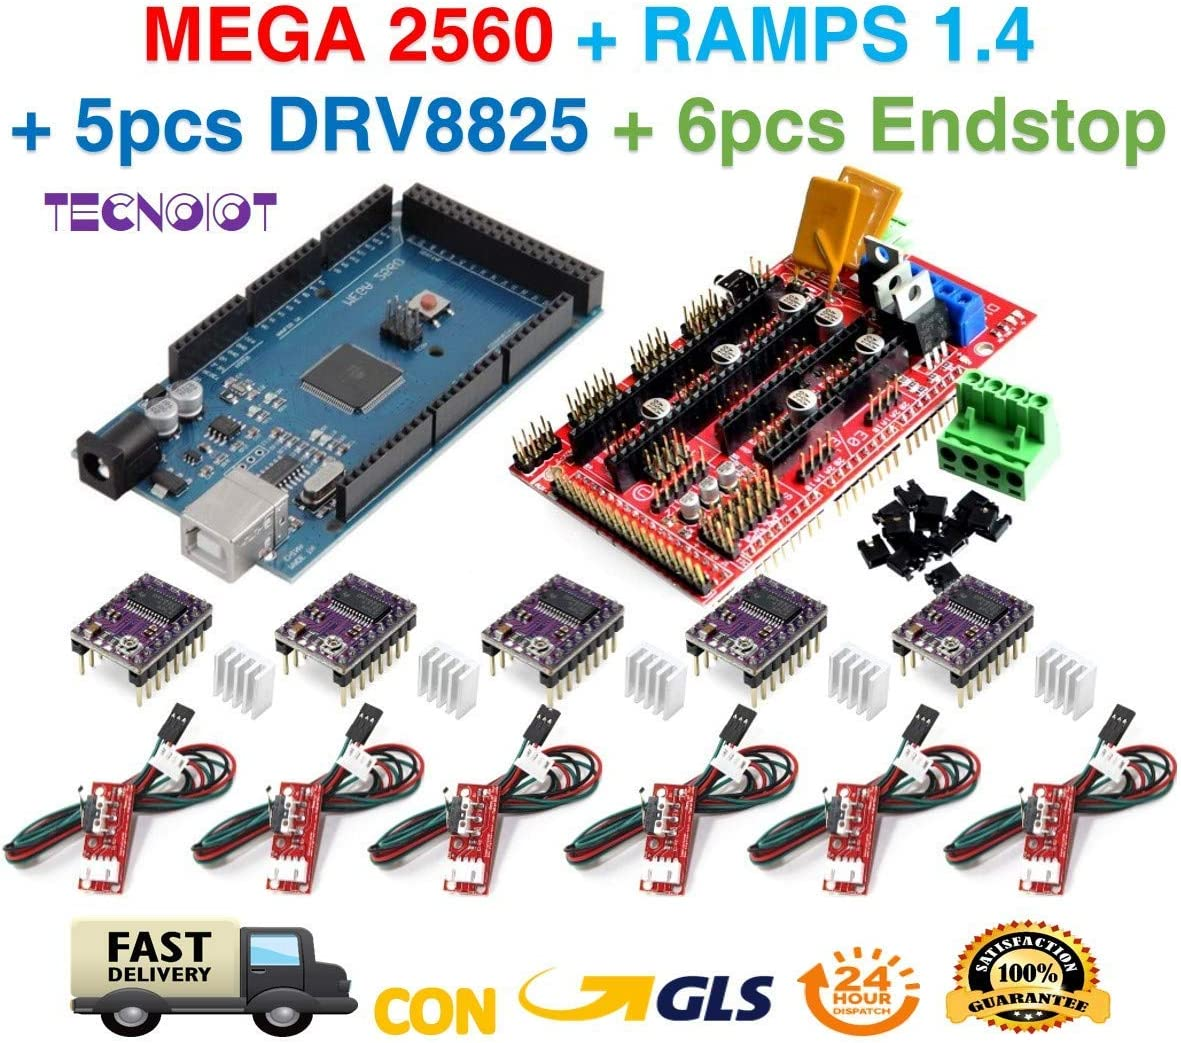 TECNOIOT Kit de Impresora 3D para Arduino Mega 2560 Junta de Desarrollo R3 + RAMPAS 1.4 Controller + 5 unids DRV8825 Motor Paso A Paso módulo + 6pcs Endstop